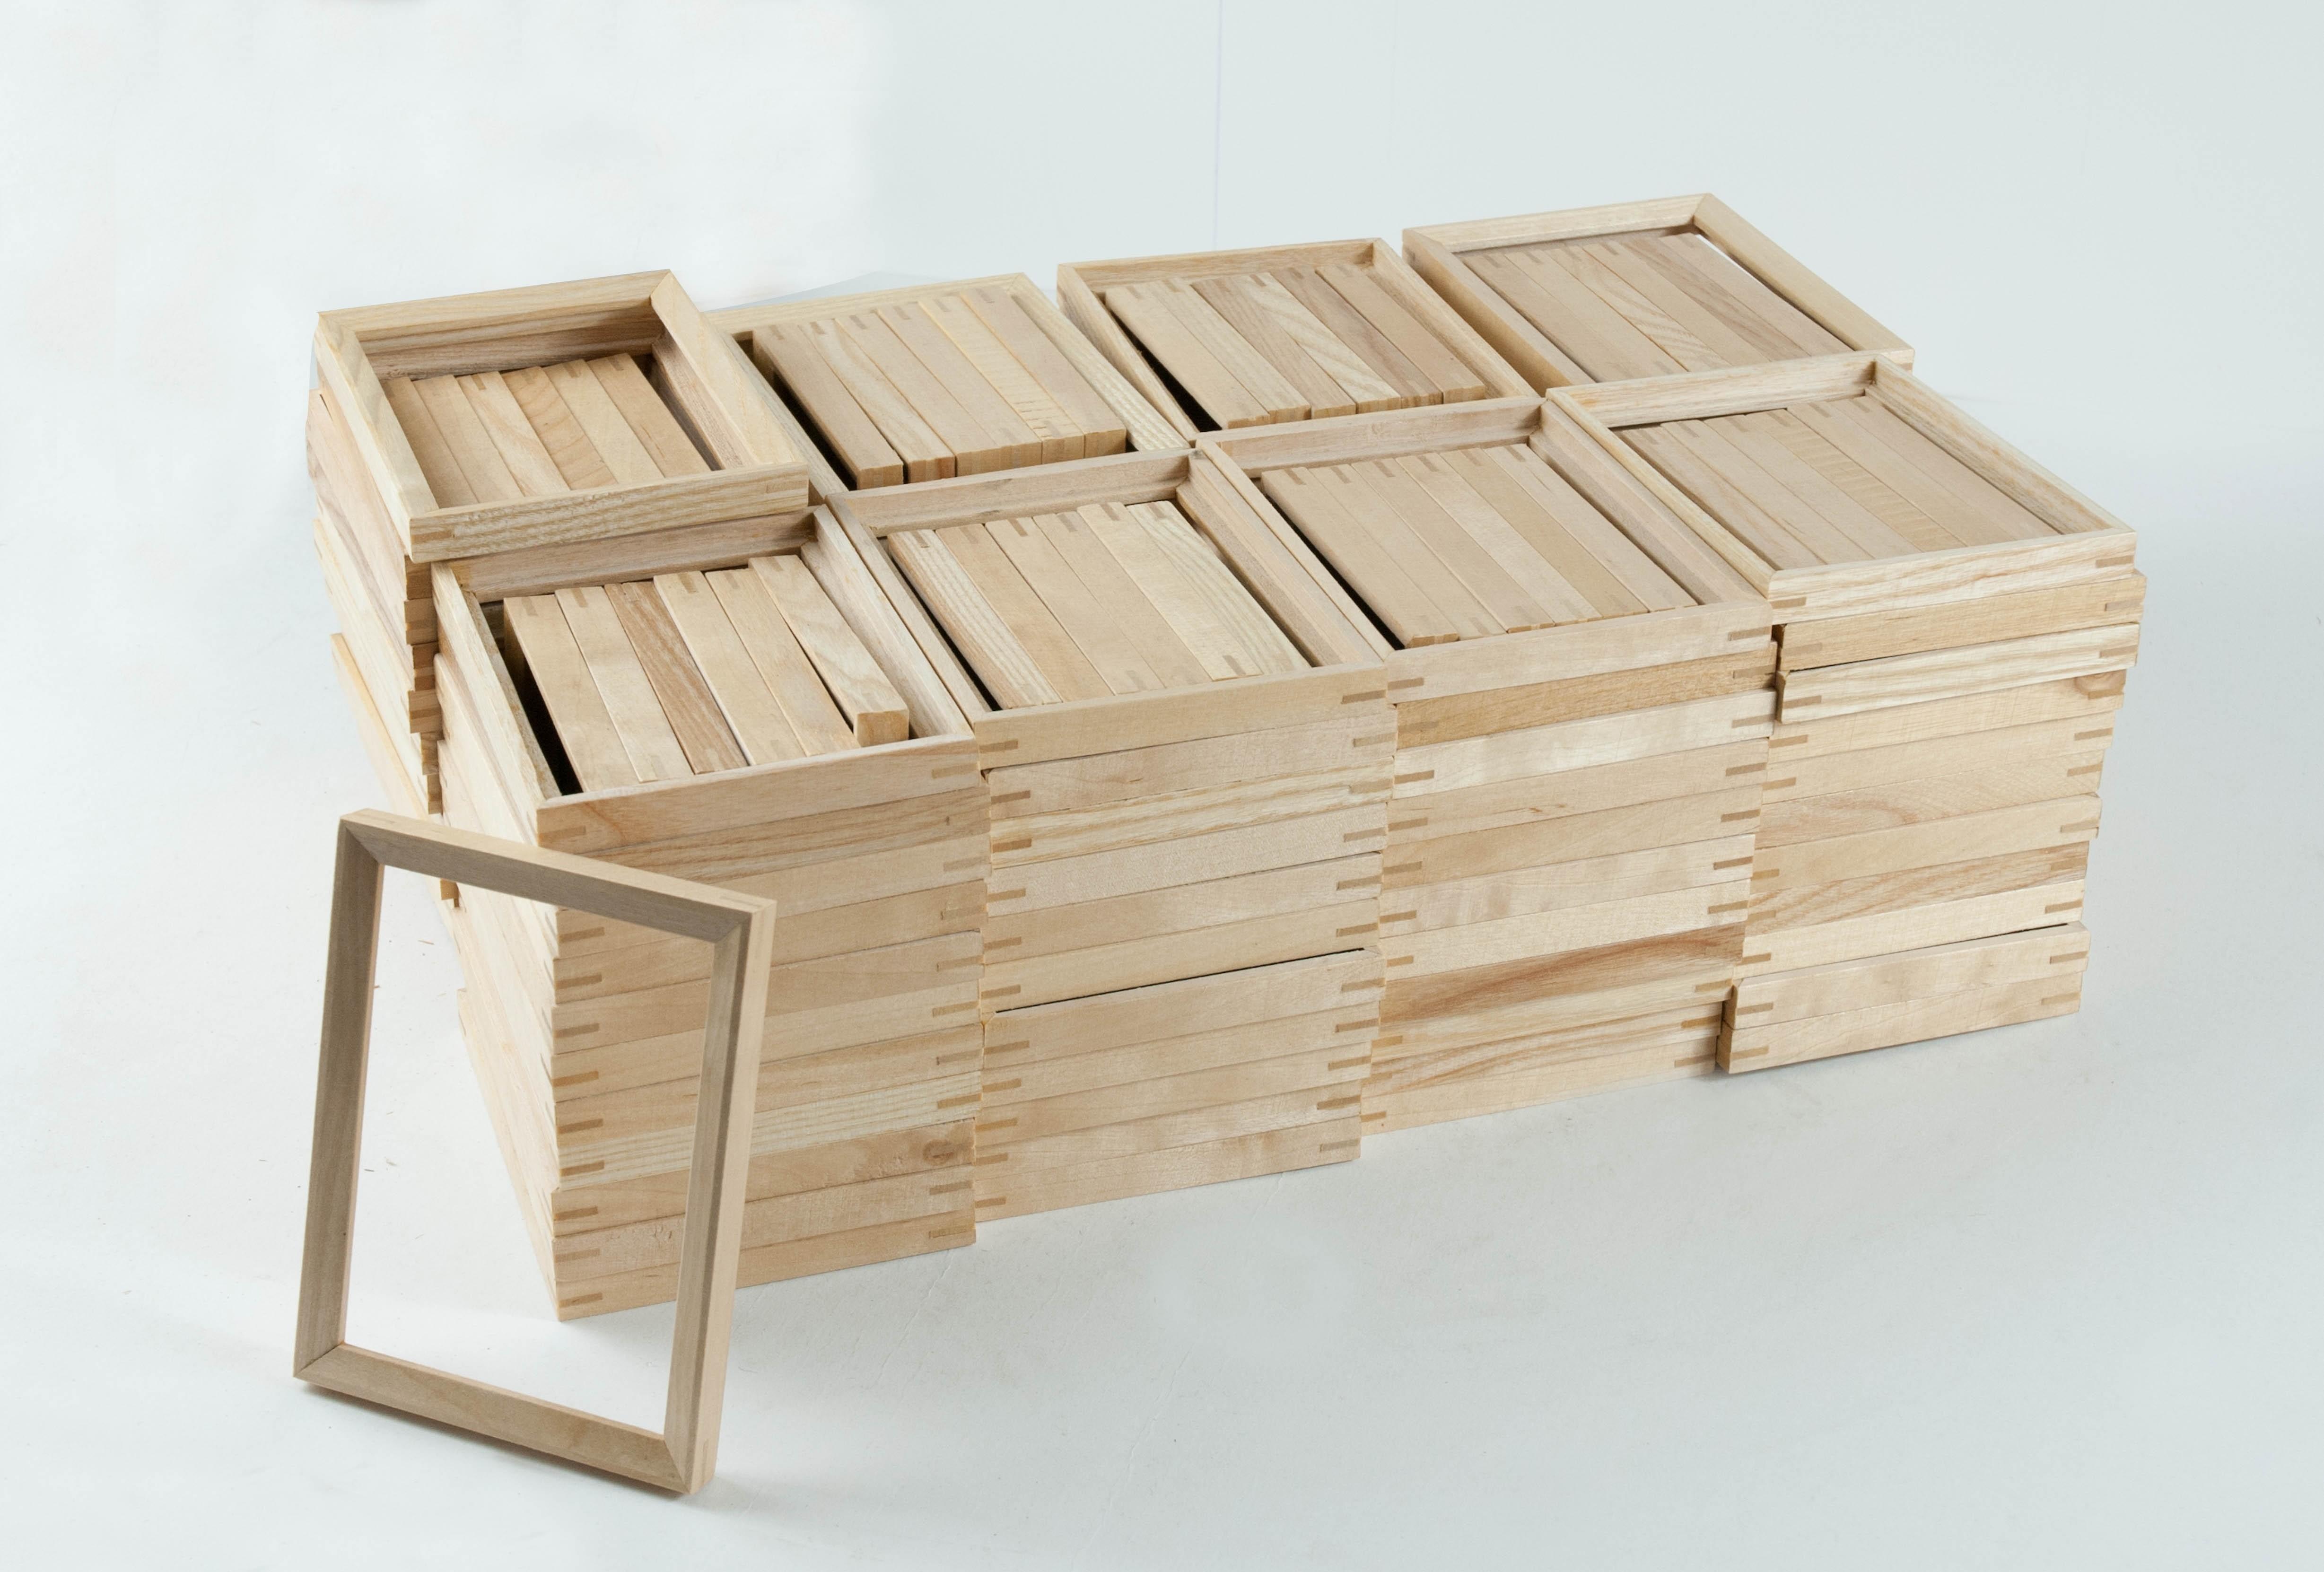 Restposten, 140 Stück Bilderrahmen 9x12cm Leerrahmen, Esche oder Erle